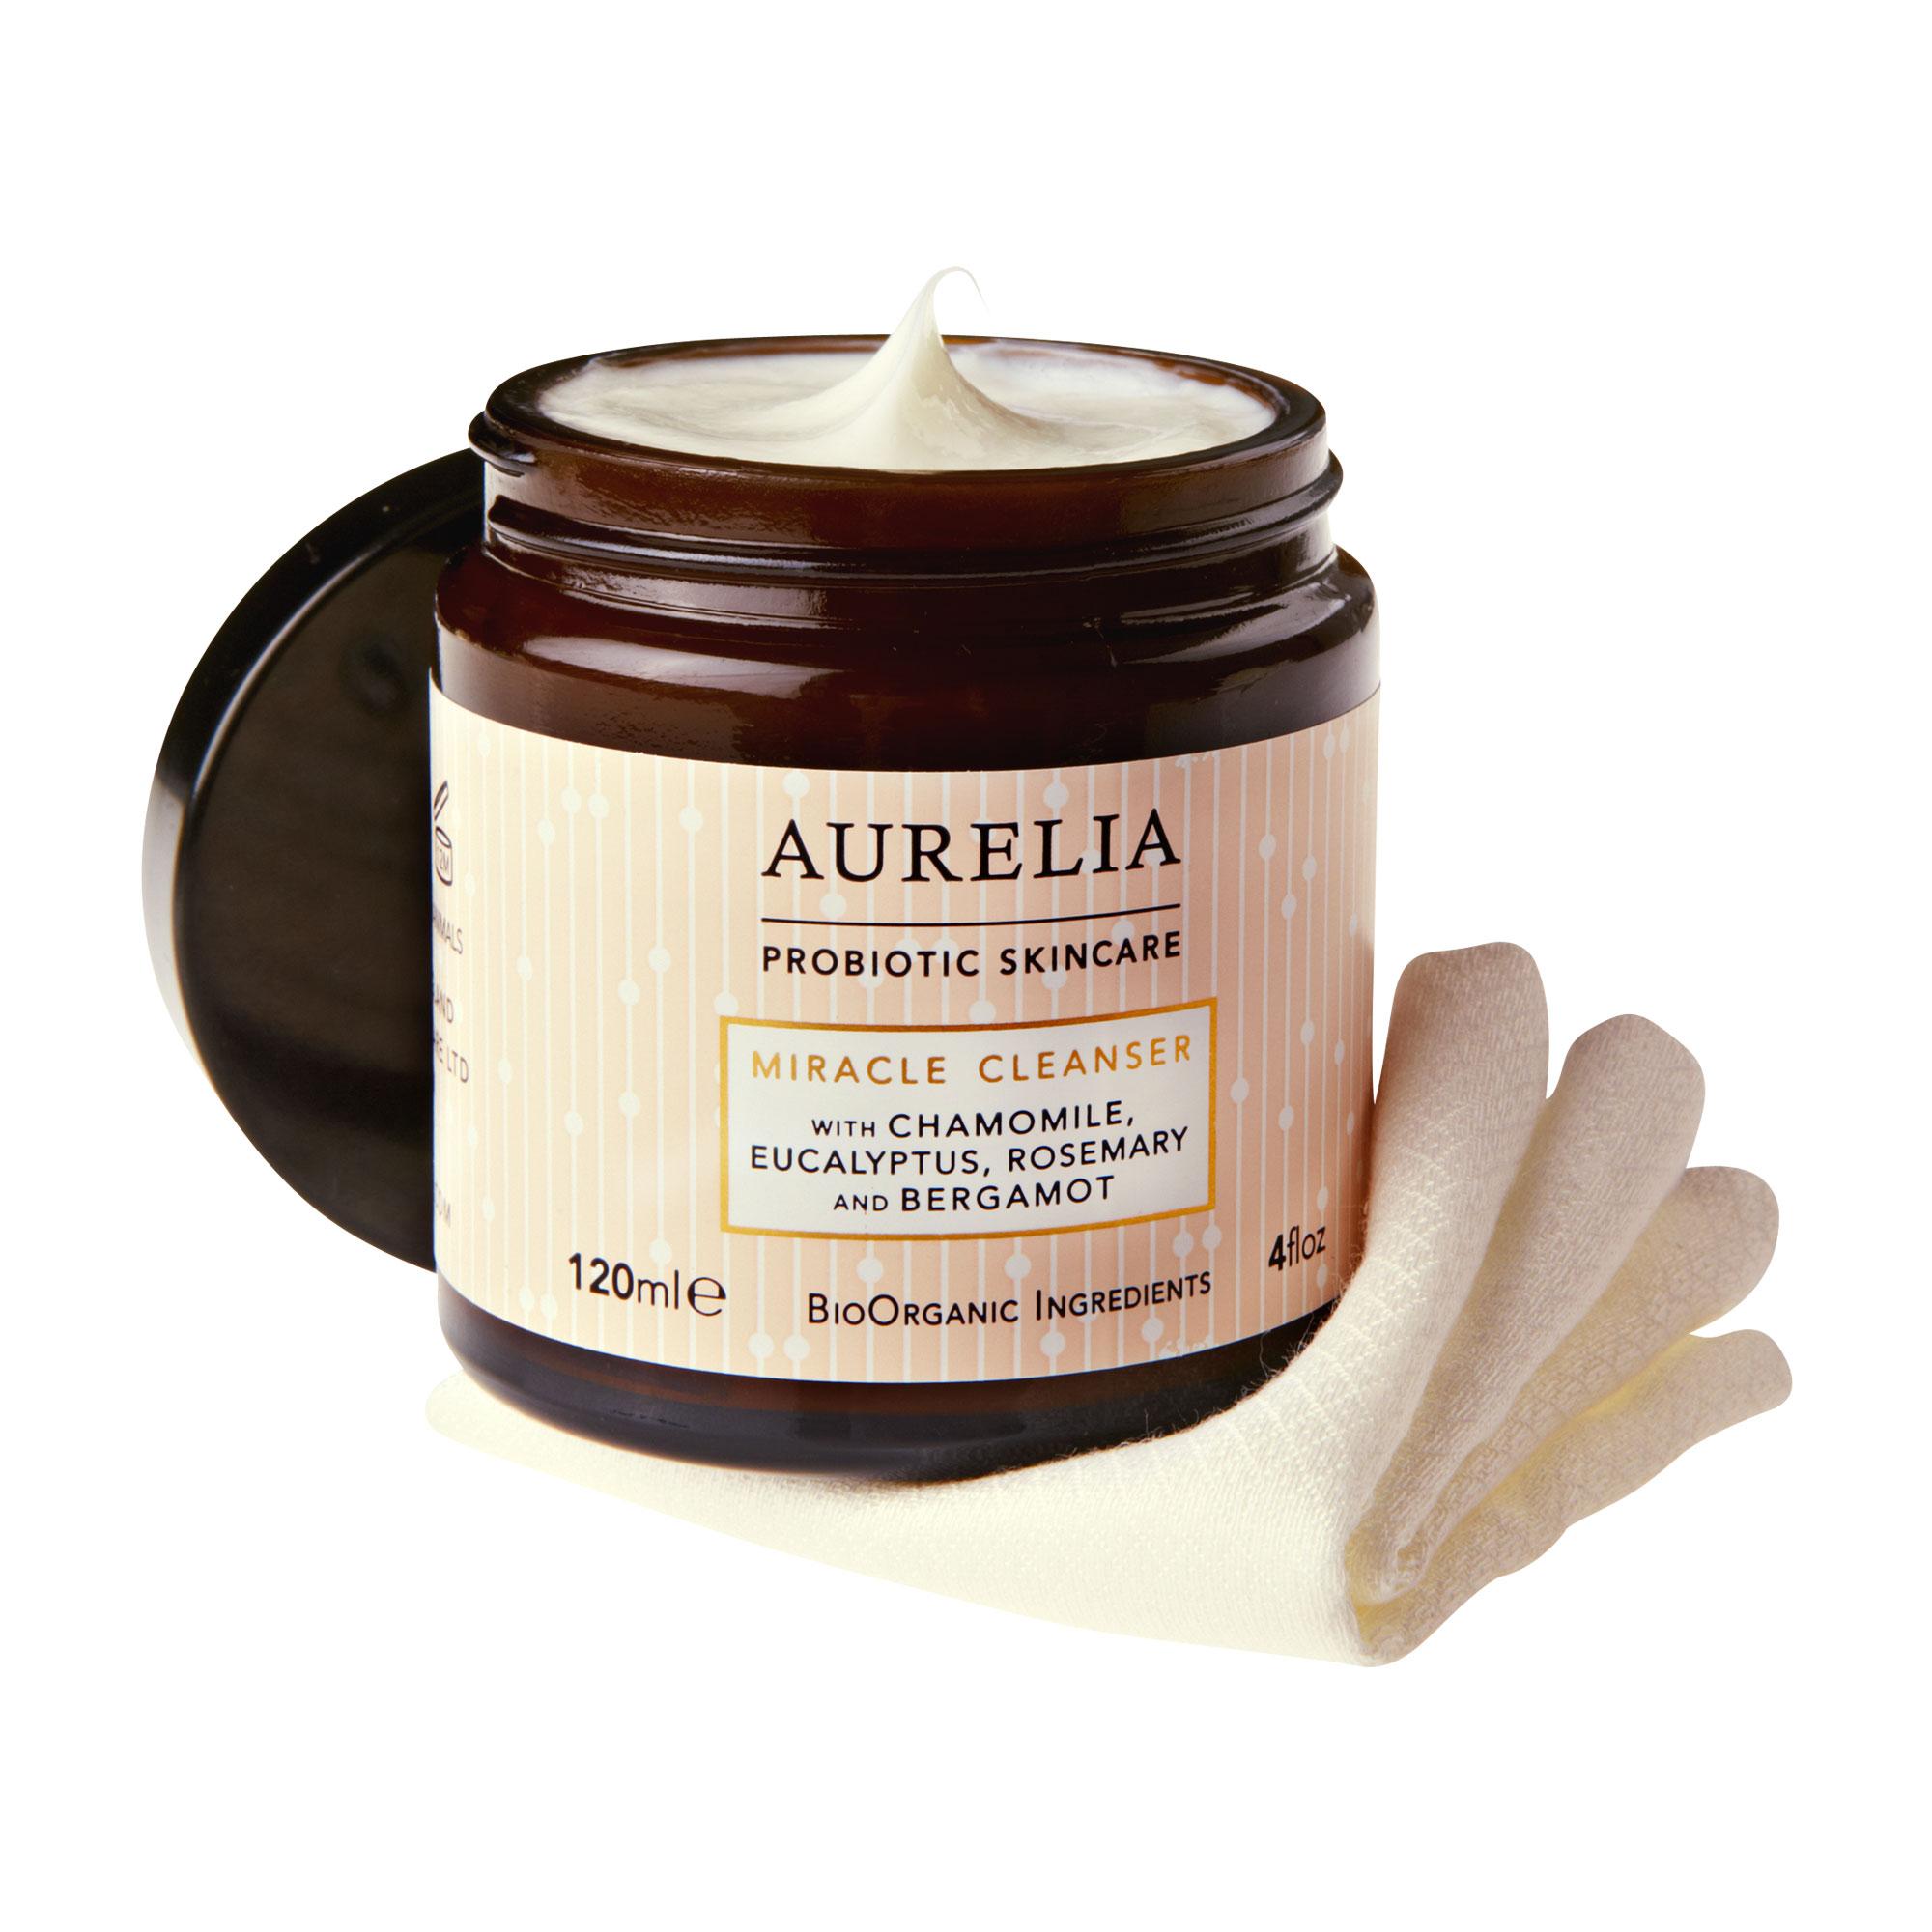 Aurelia Miracle Cleanser, 120 ml